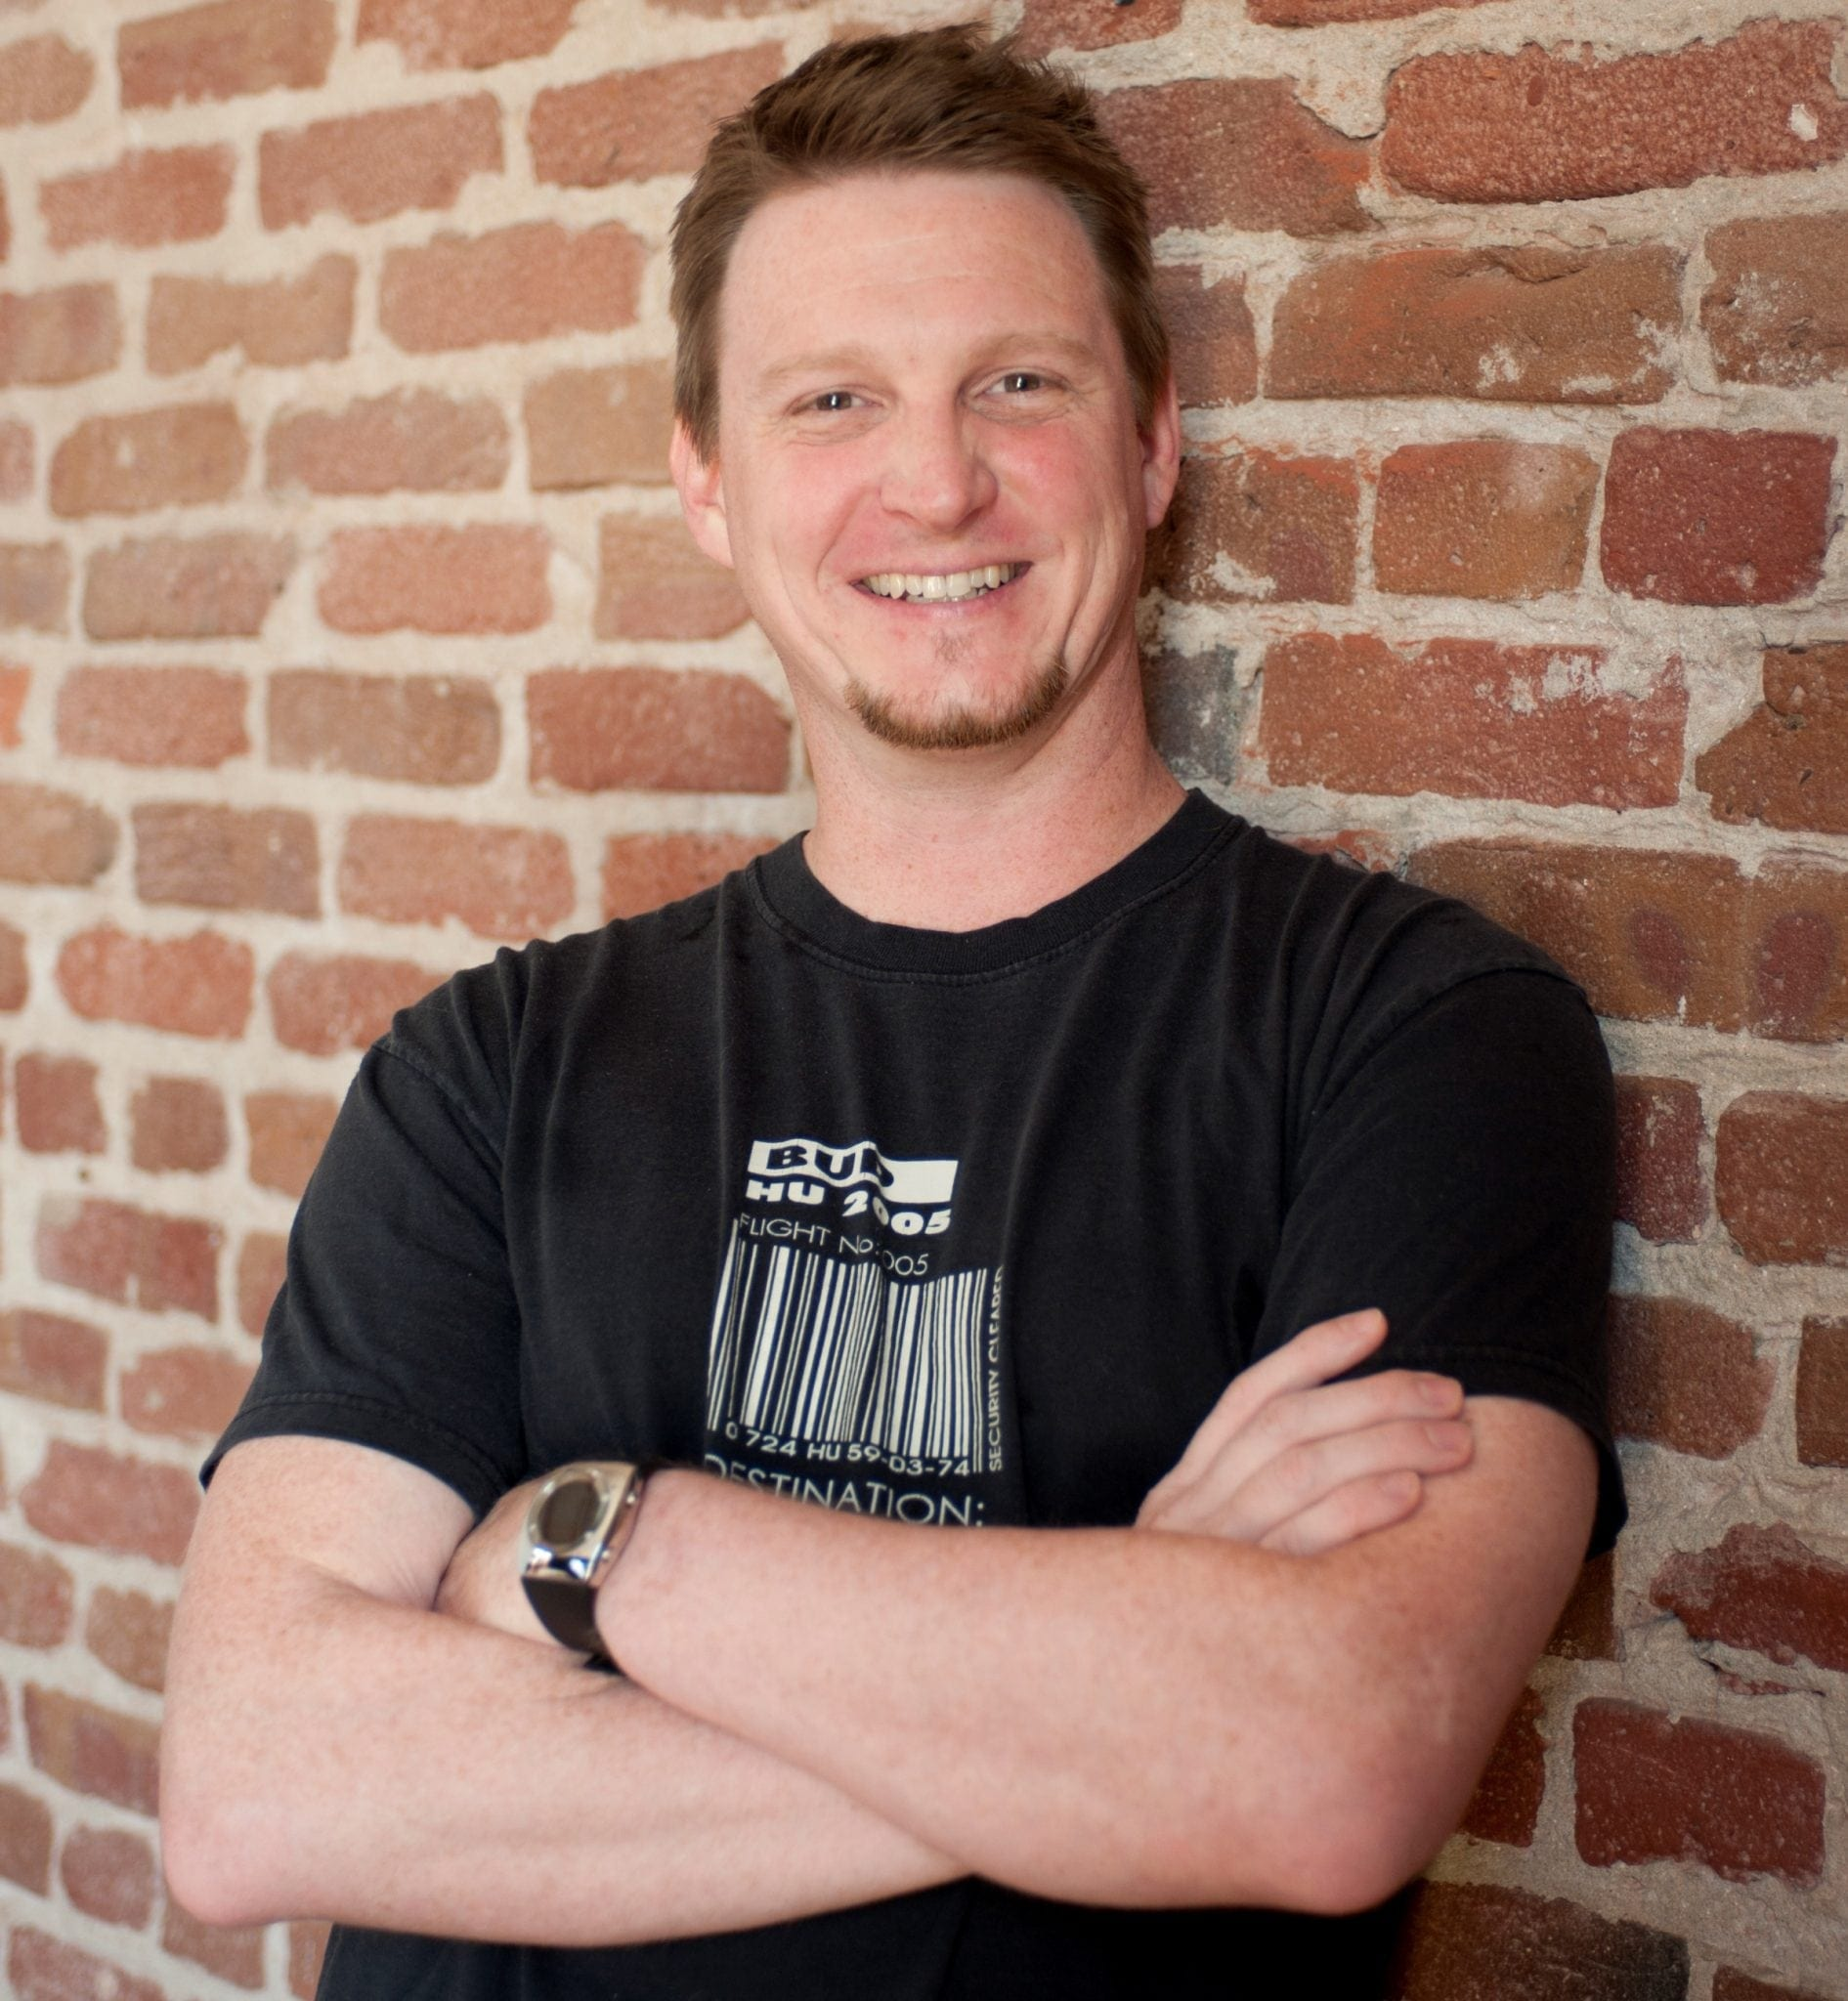 Basis: inovația în domeniul wearables continuă.Interviu cu Jef Holove, General Manager, Basis, New Technology Group, Intel.